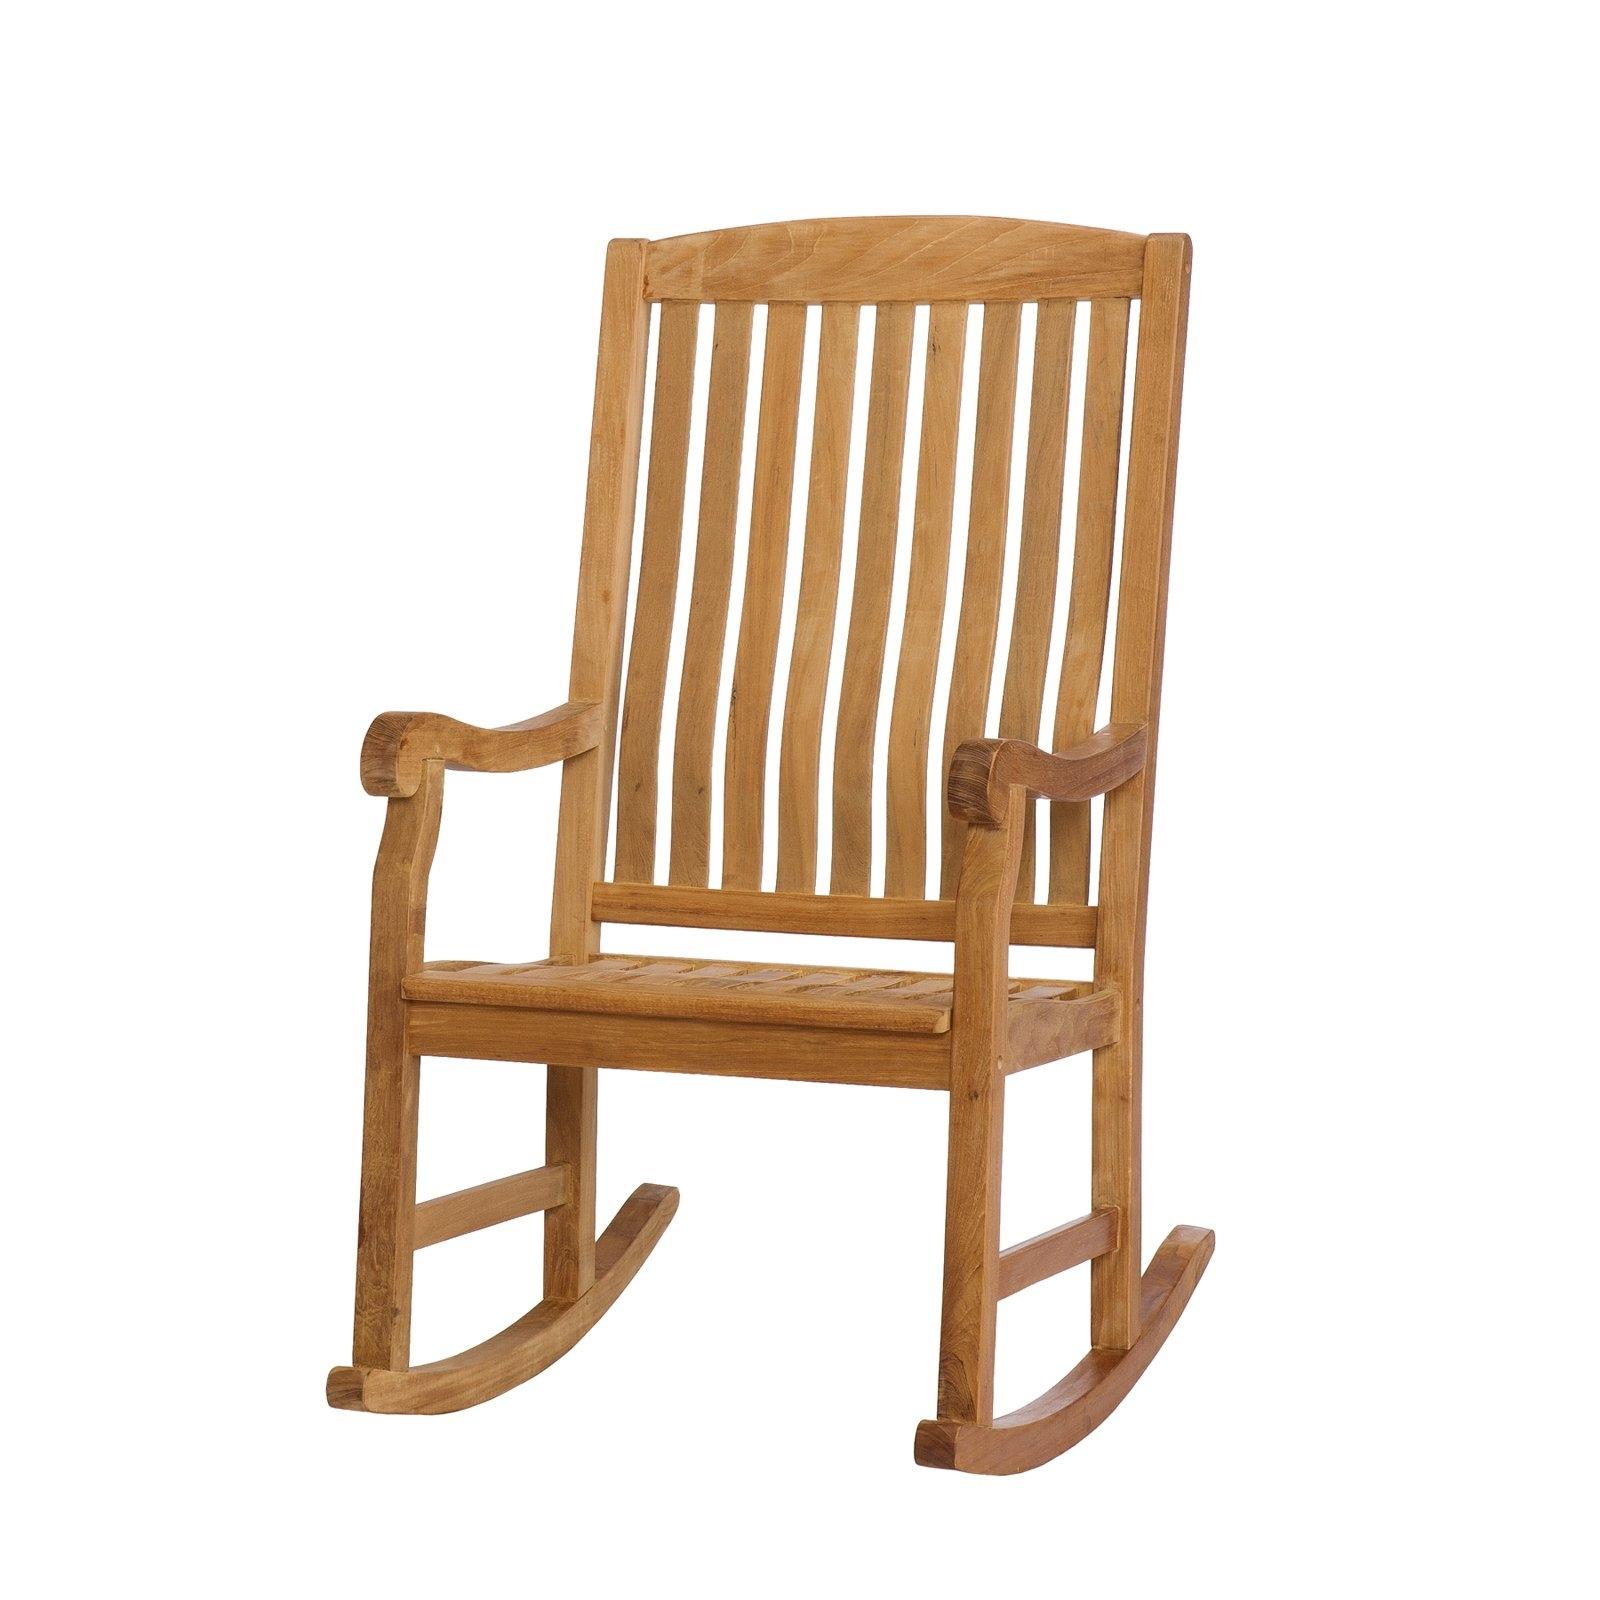 Southern Enterprises Teak Porch Rocker – Natural Oil – Walmart In Trendy Teak Patio Rocking Chairs (View 11 of 15)